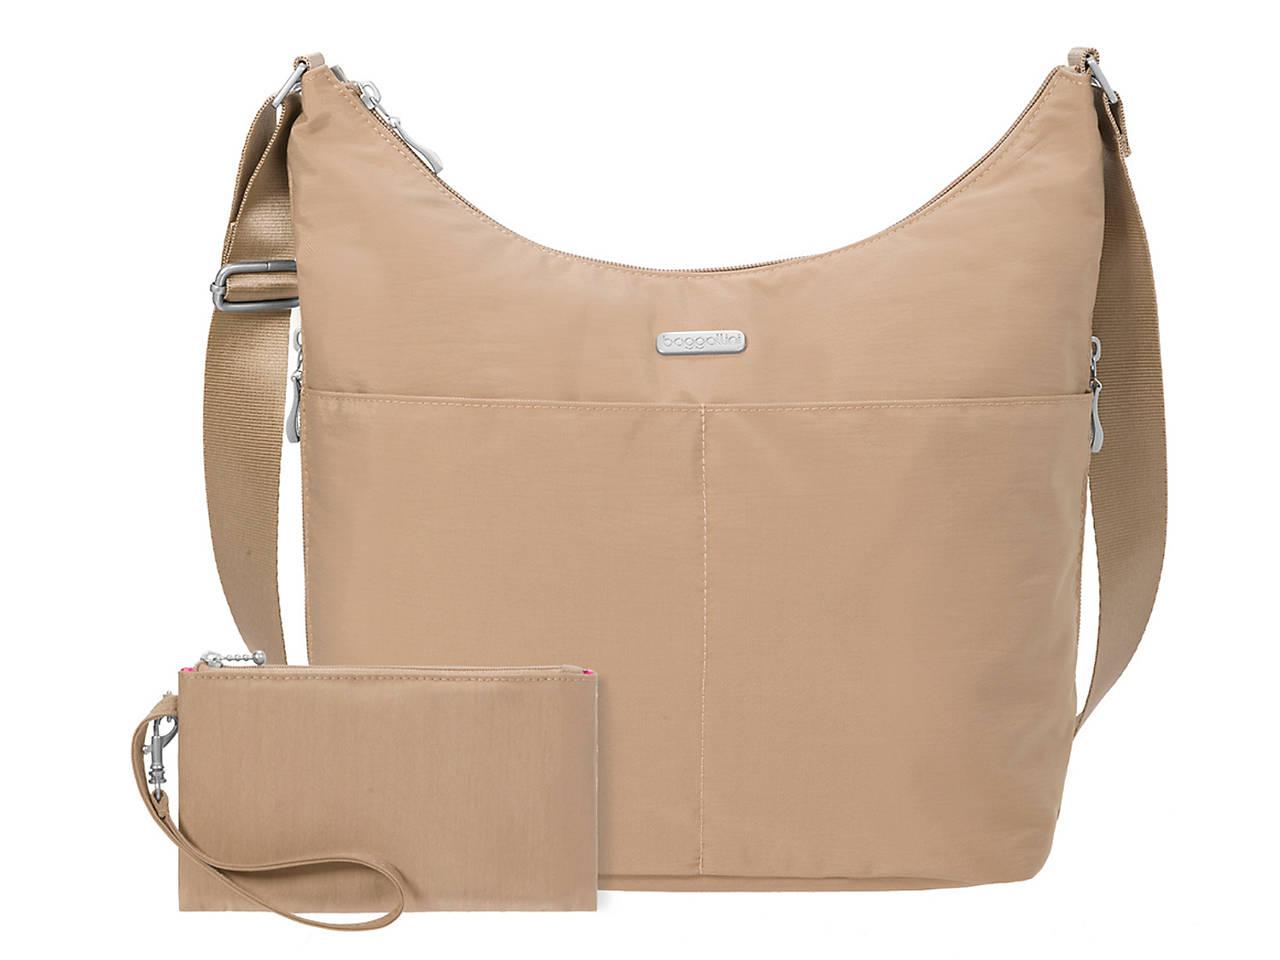 Baggallini Hobo Bag Women s Handbags   Accessories  b6d91455b9079